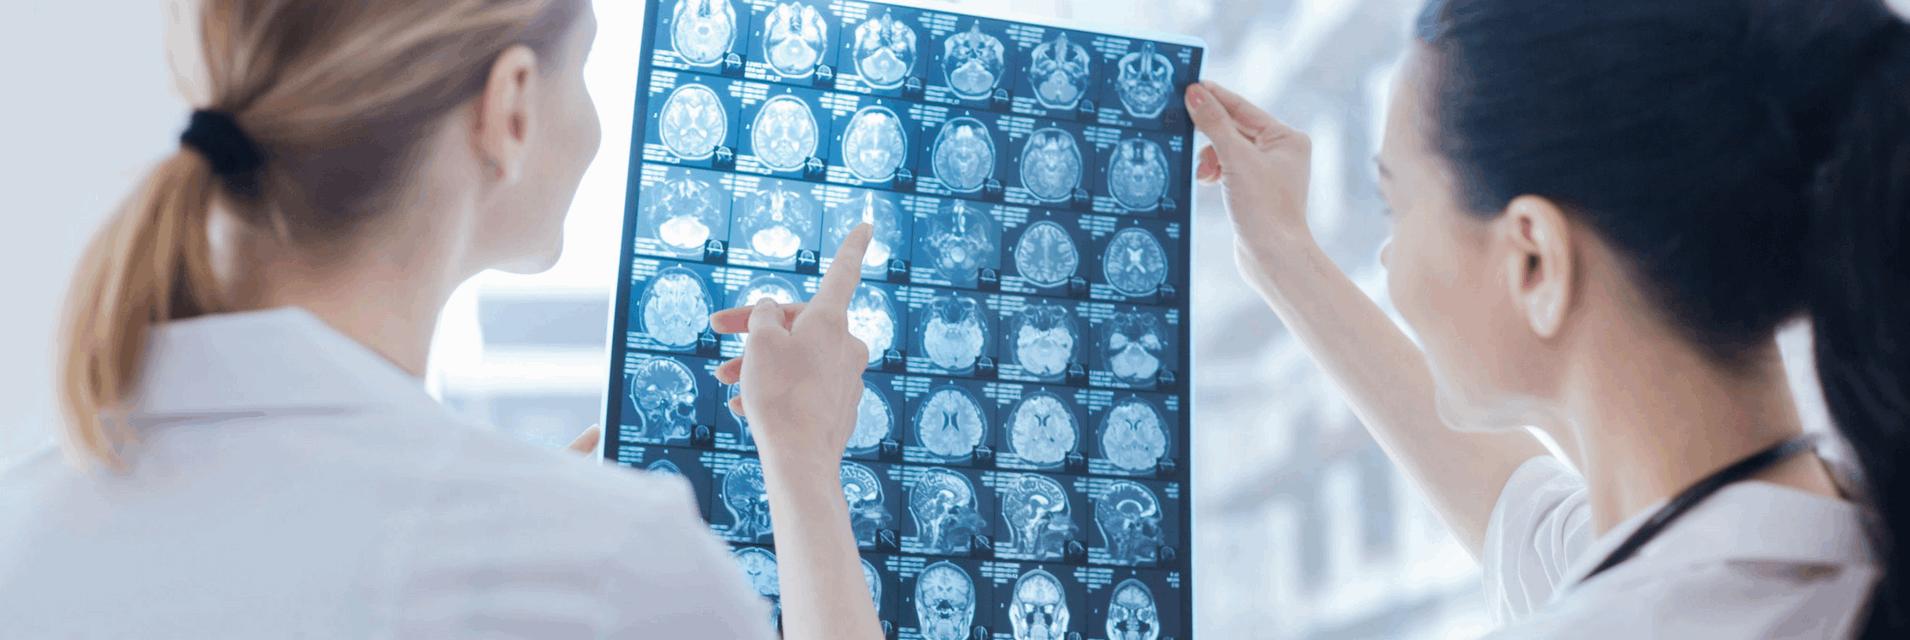 konsultacja neurologiczna BetaMed - baner